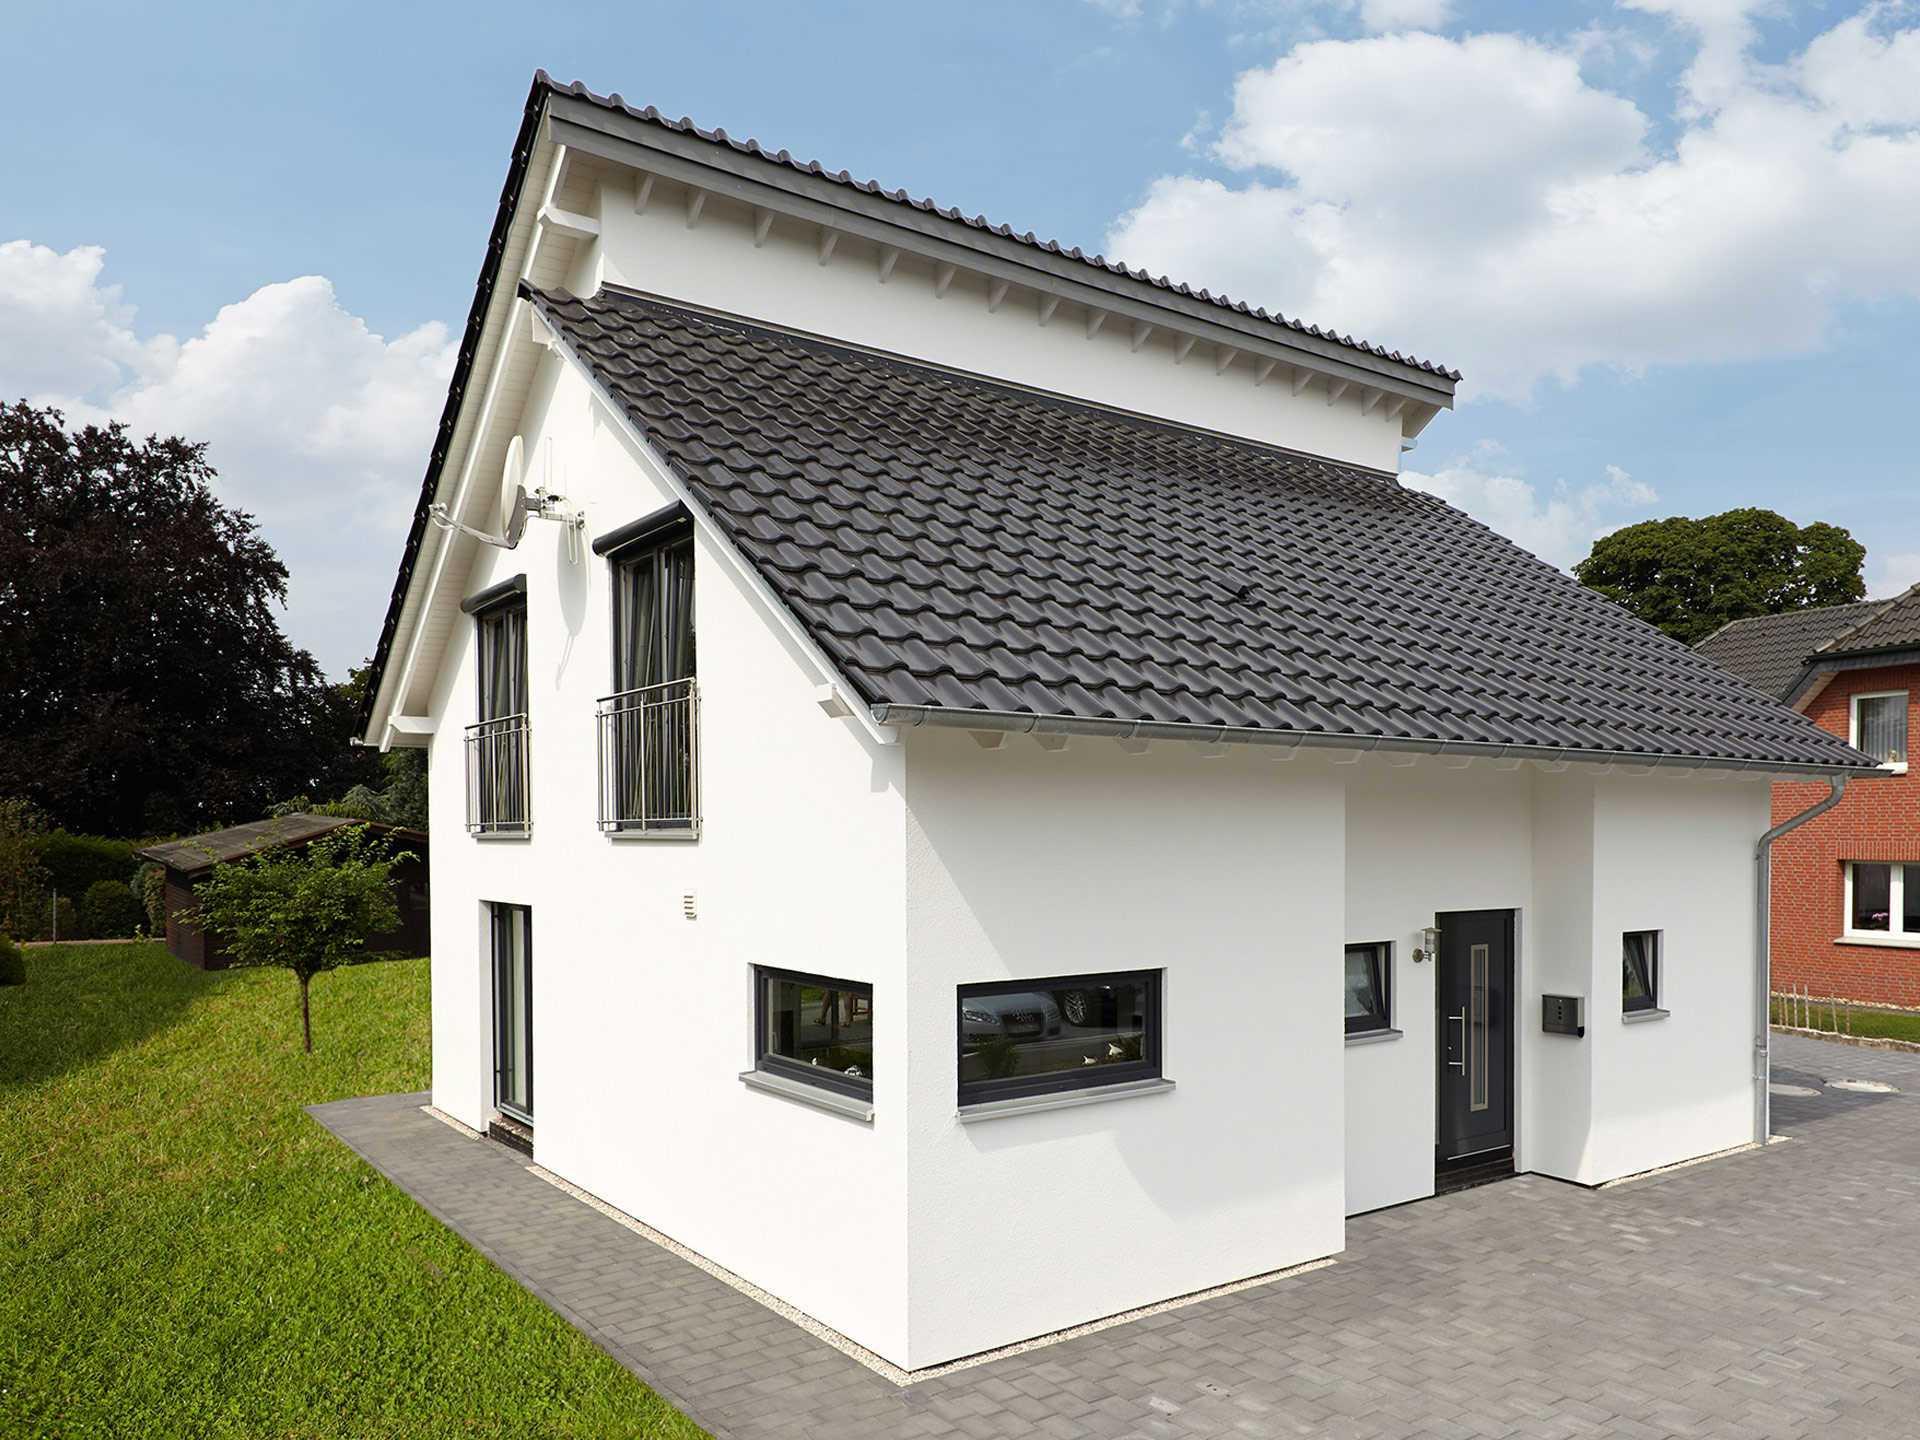 Theodor Roreger - Pultdachhaus